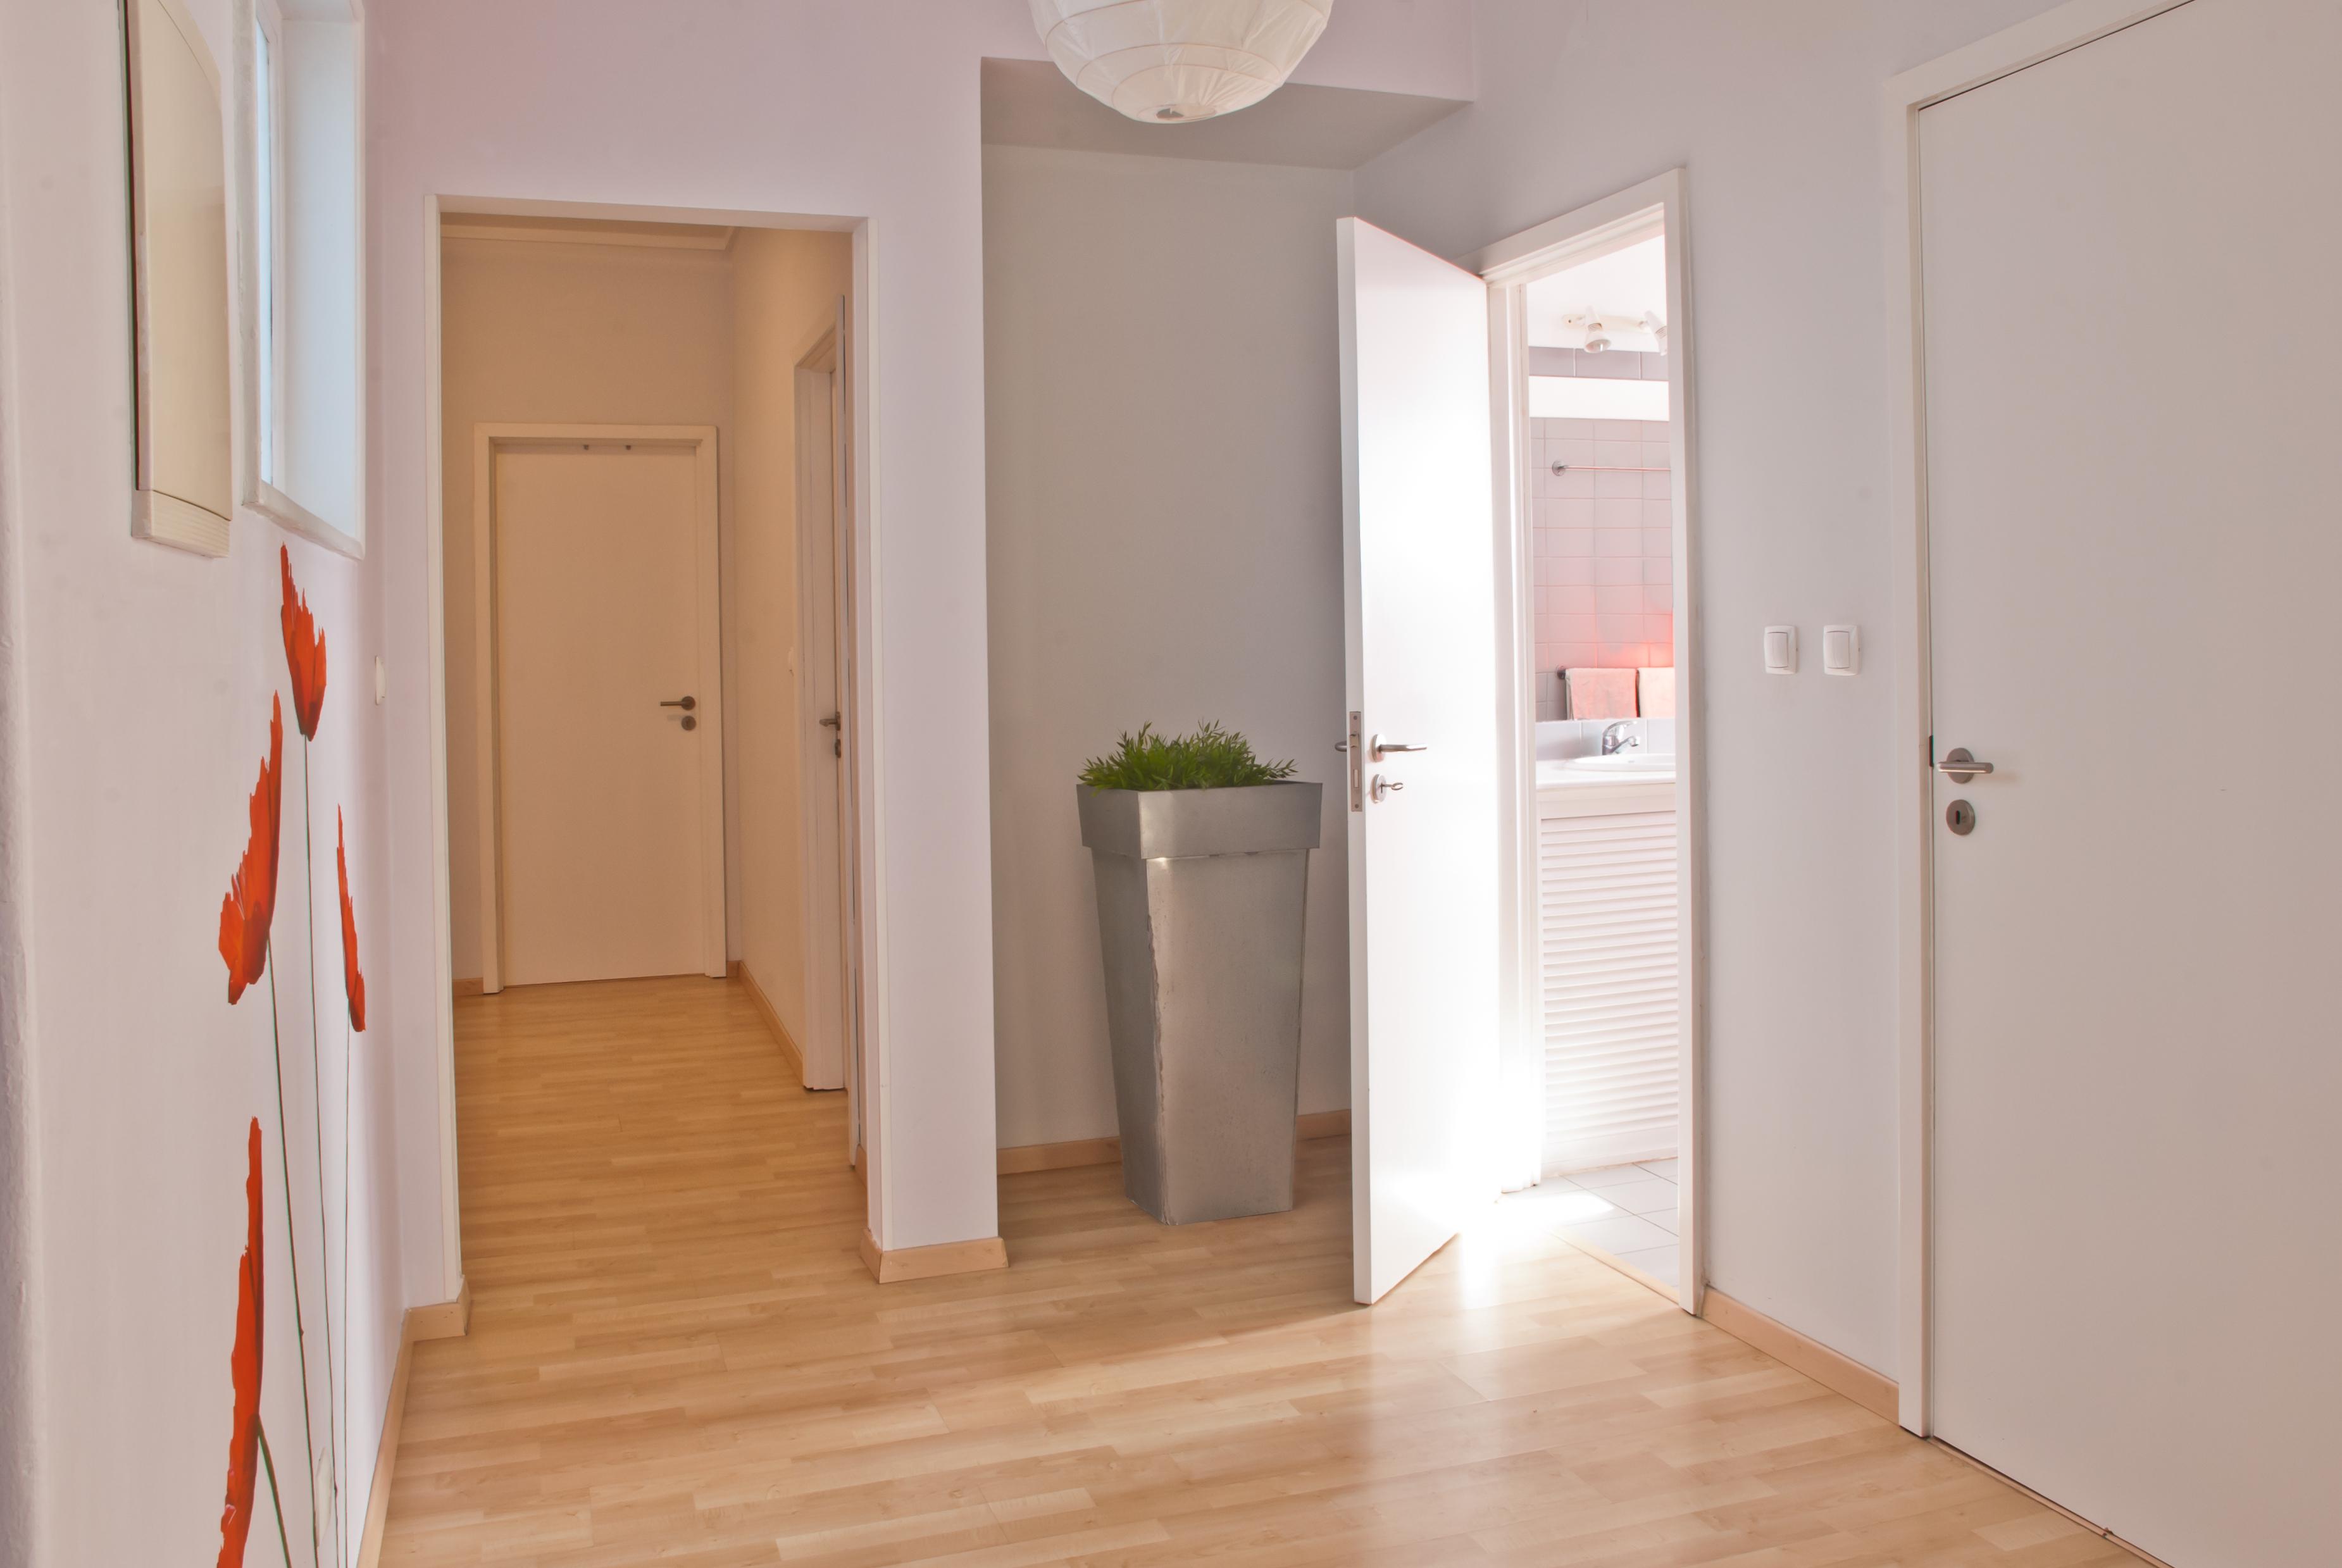 AB - Geral - Foto 4 - Hall piso quartos.Hall room floor.jpg